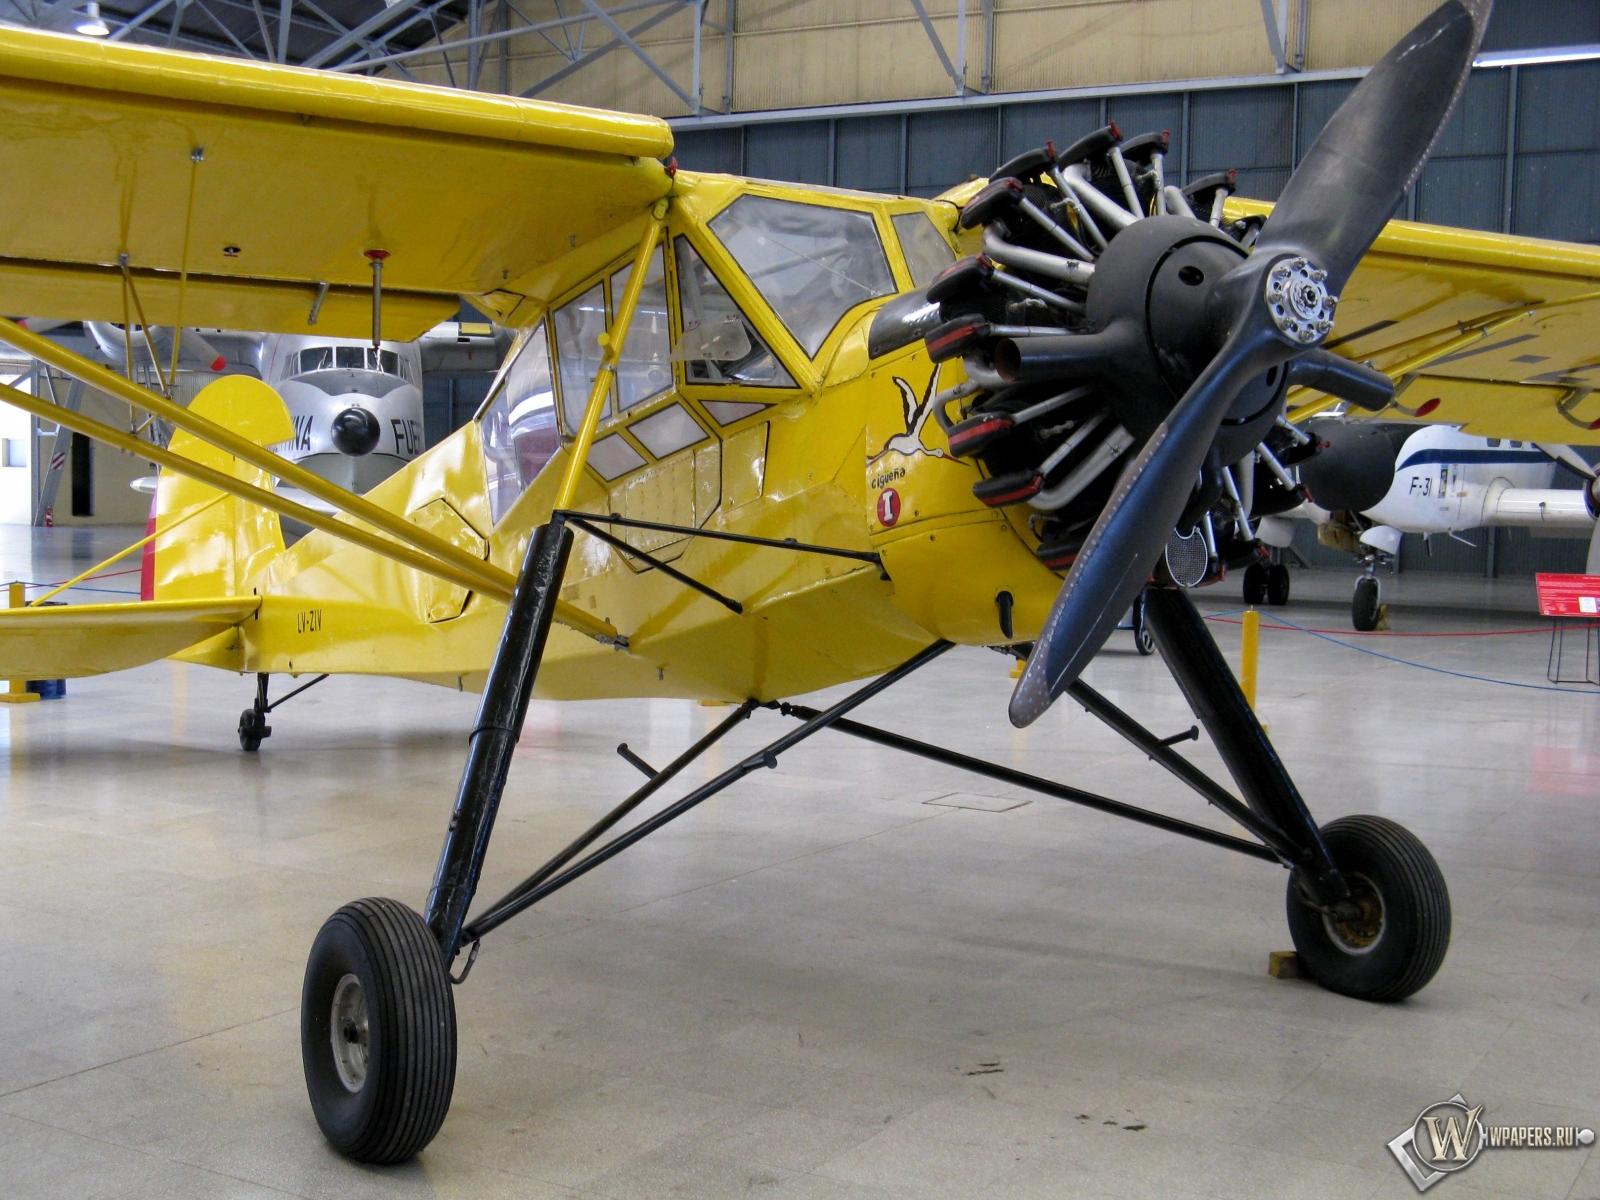 Fieseler Storch Fi-156 1600x1200